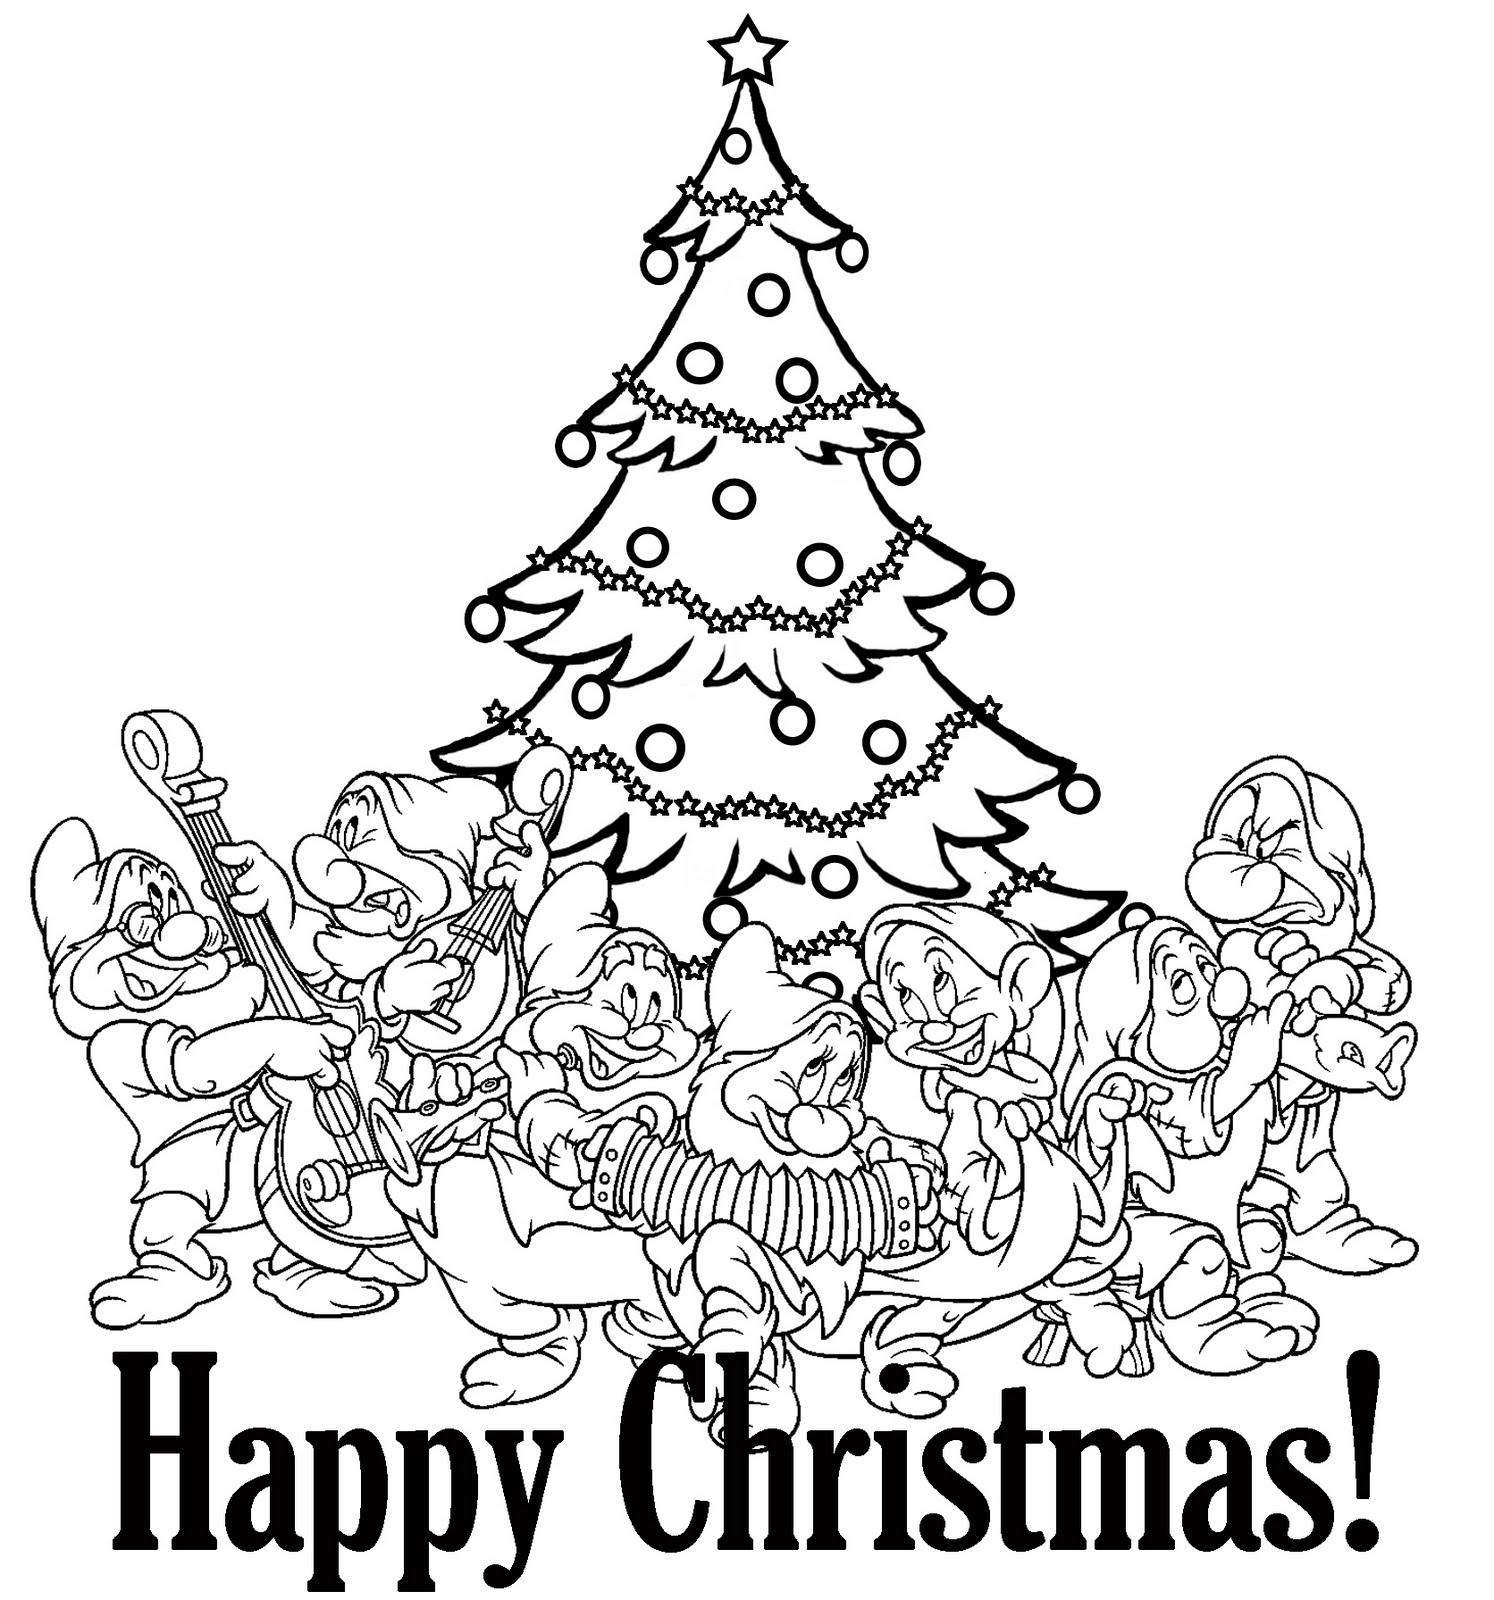 christmas coloring pages disney - november 2008